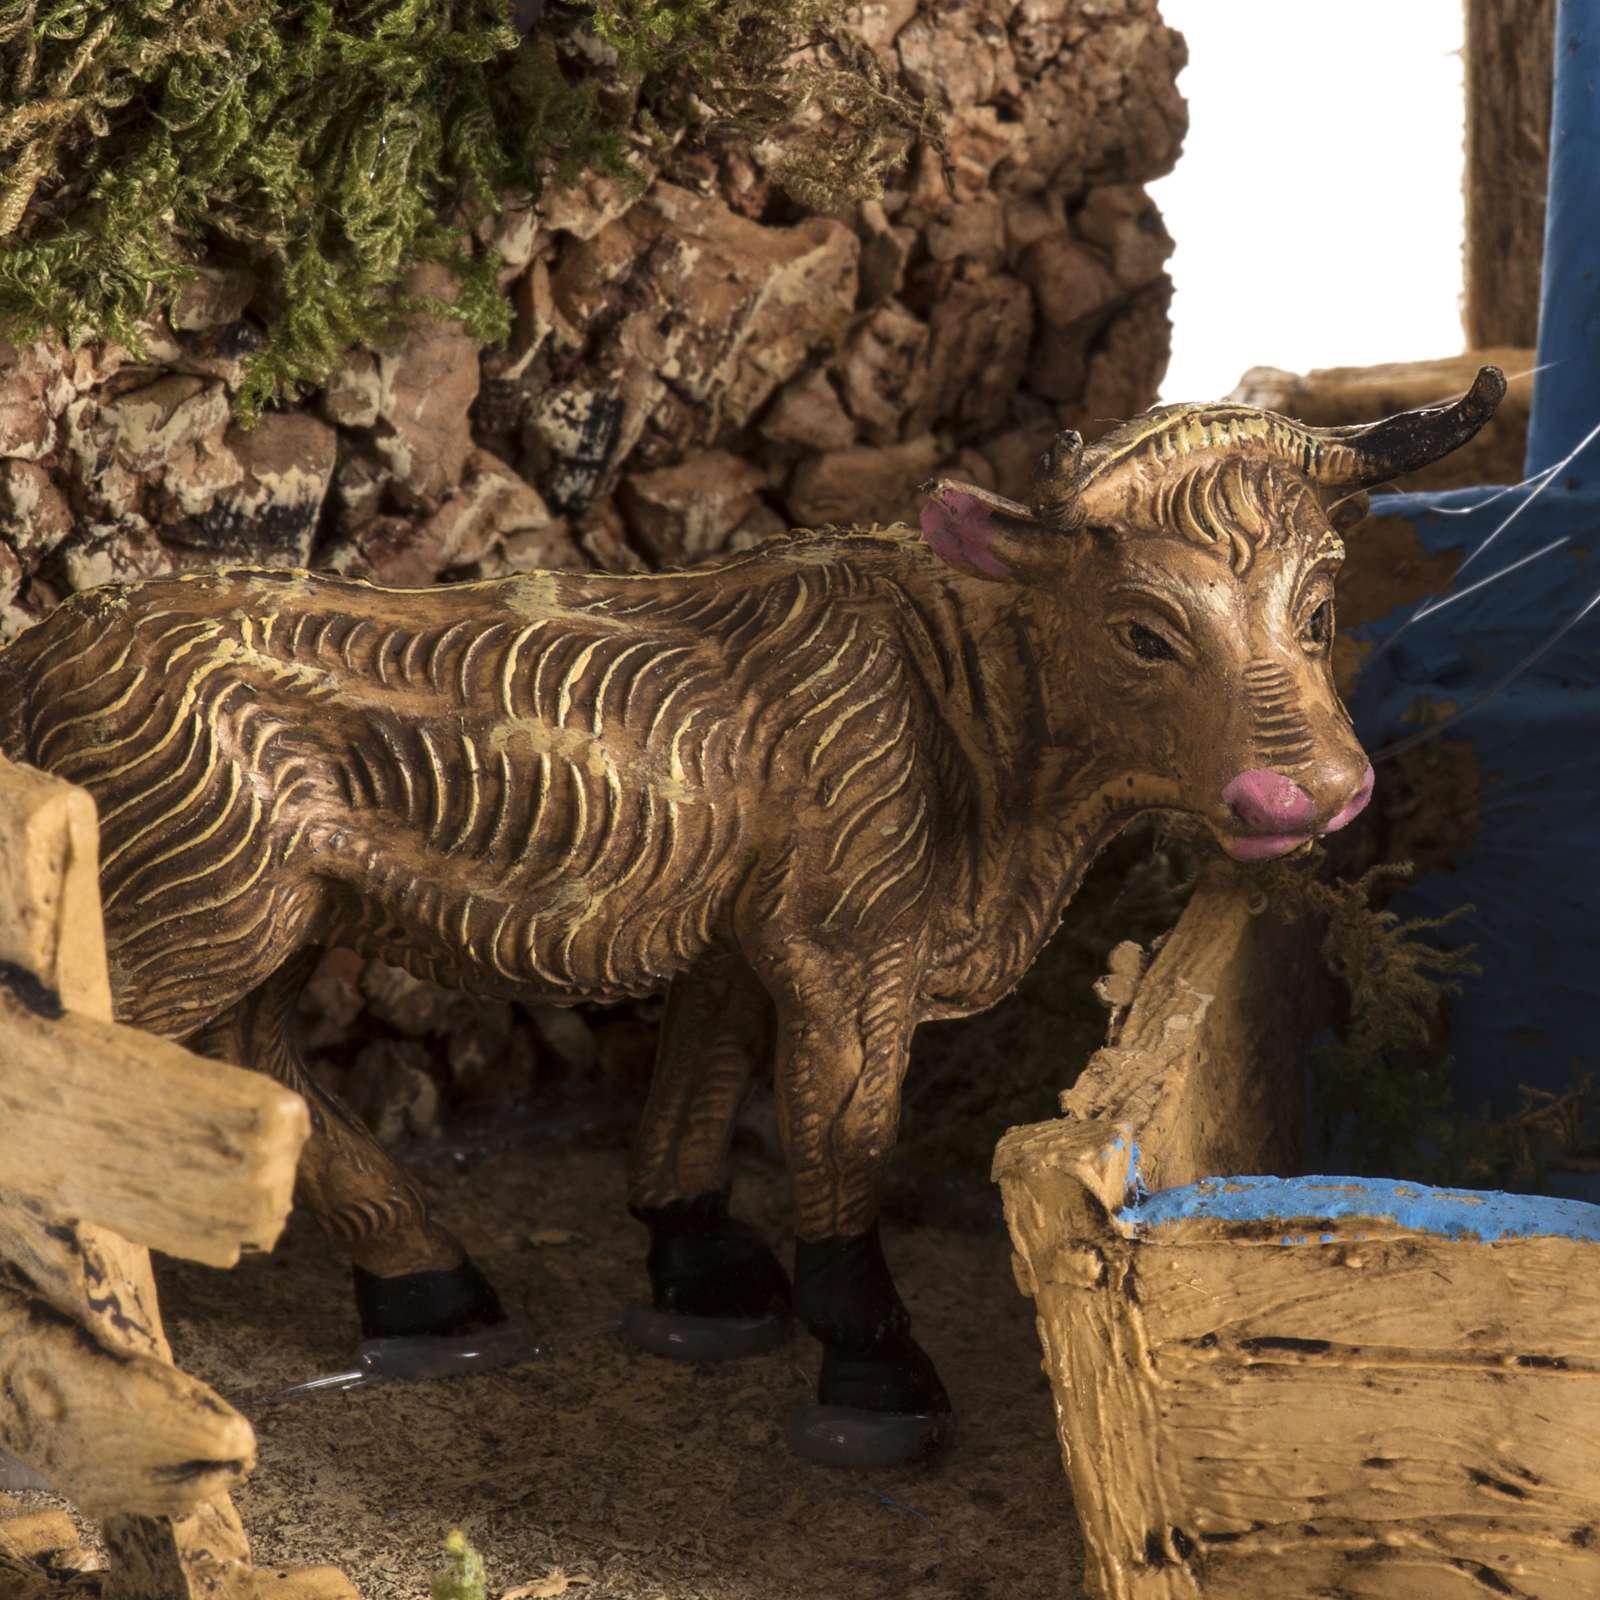 Mucca con finta fontana ambientazione presepe 8-10 cm 3